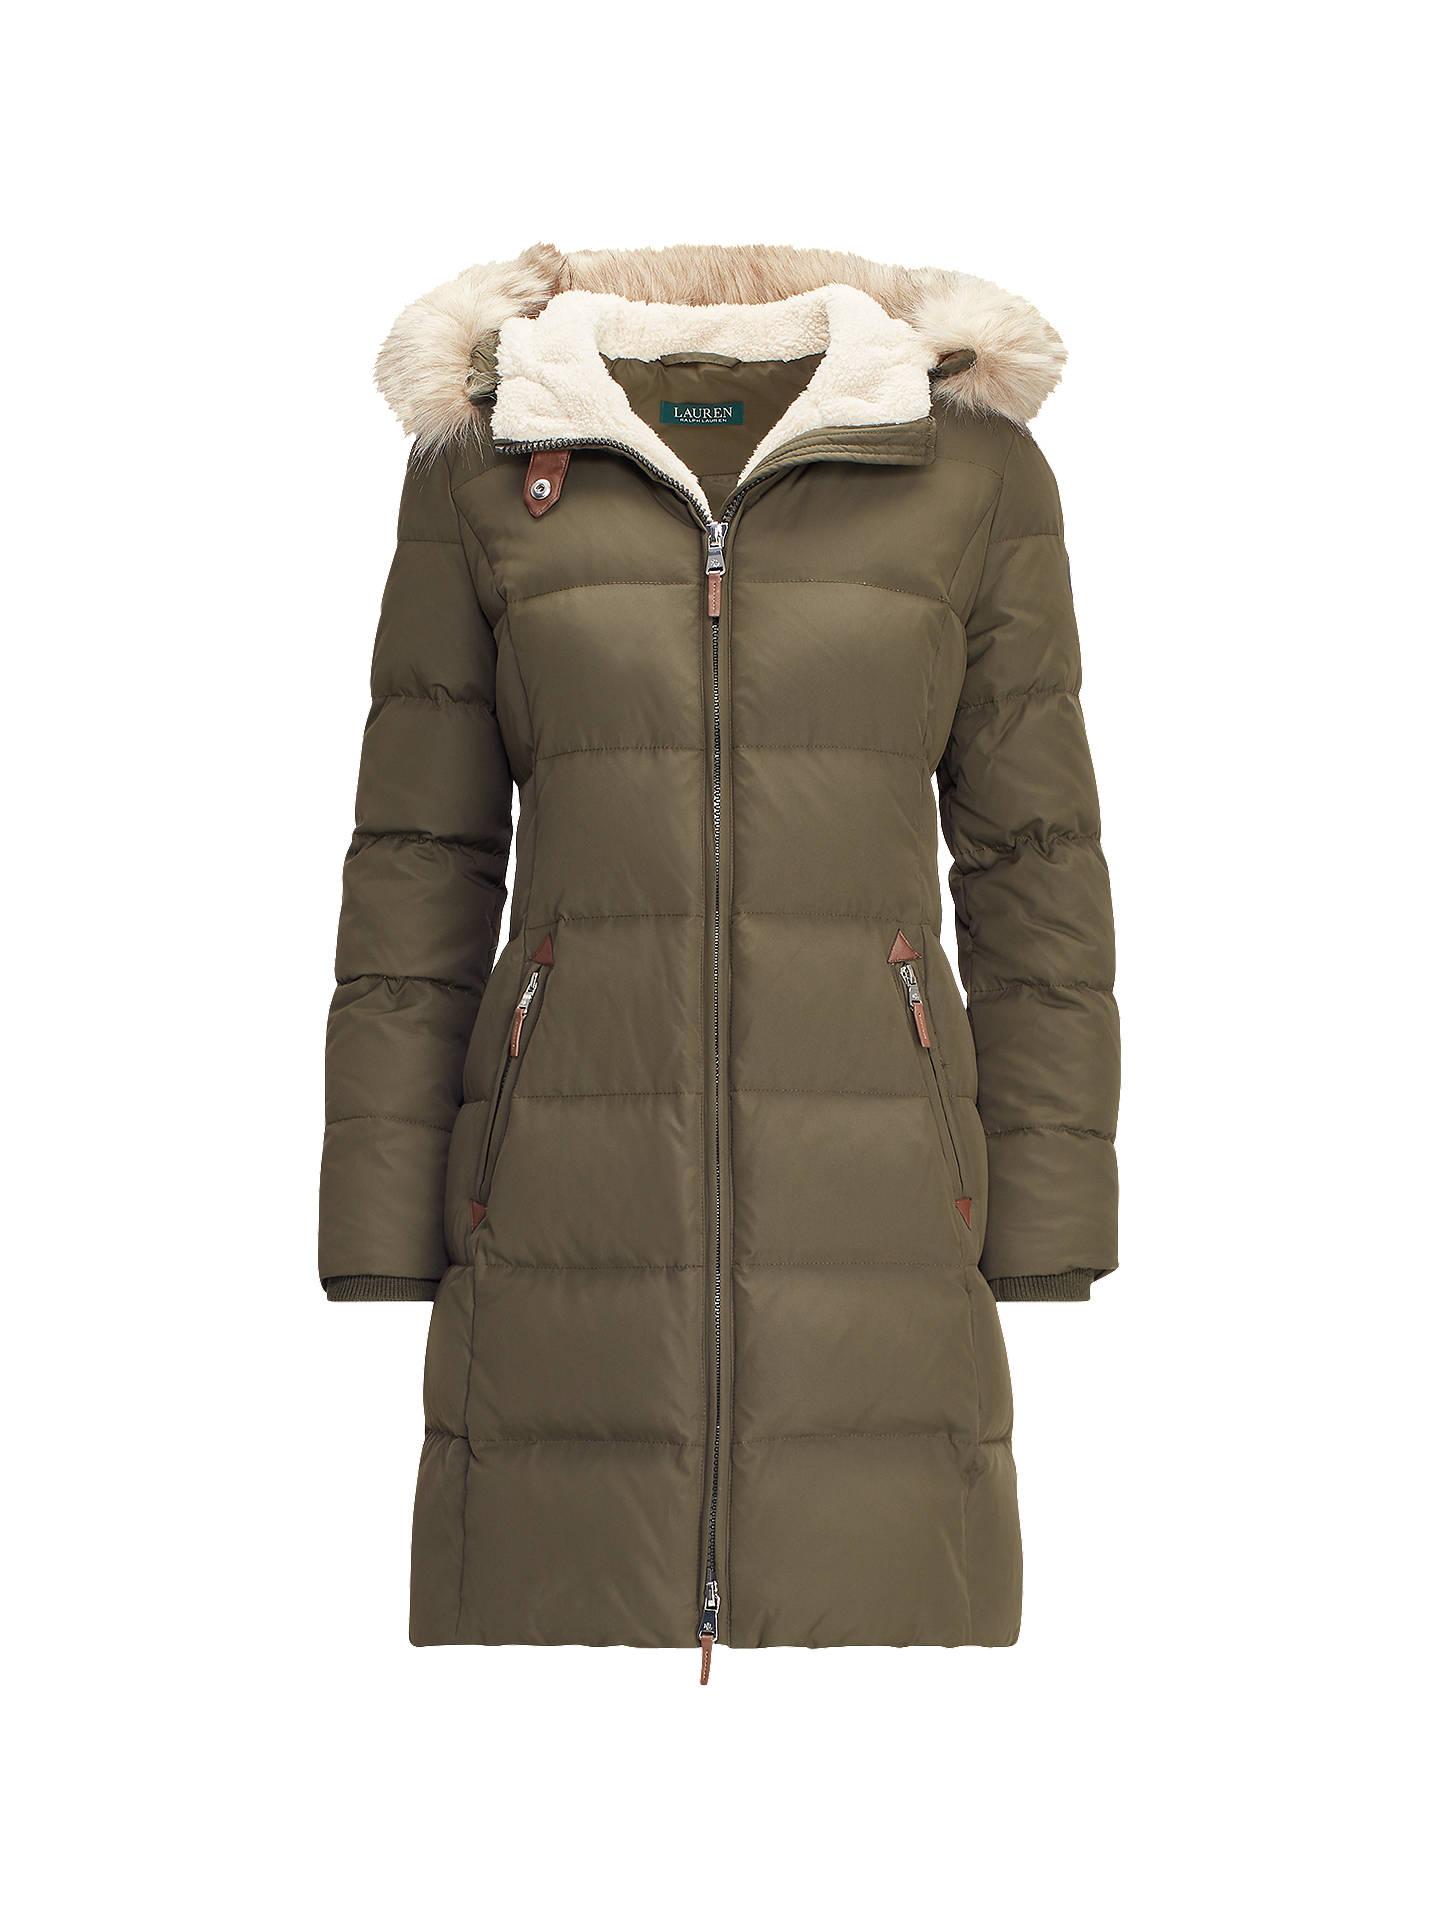 2b0907010 Buy Lauren Ralph Lauren Padded Down Jacket, Litchfield Loden, XS Online at  johnlewis.